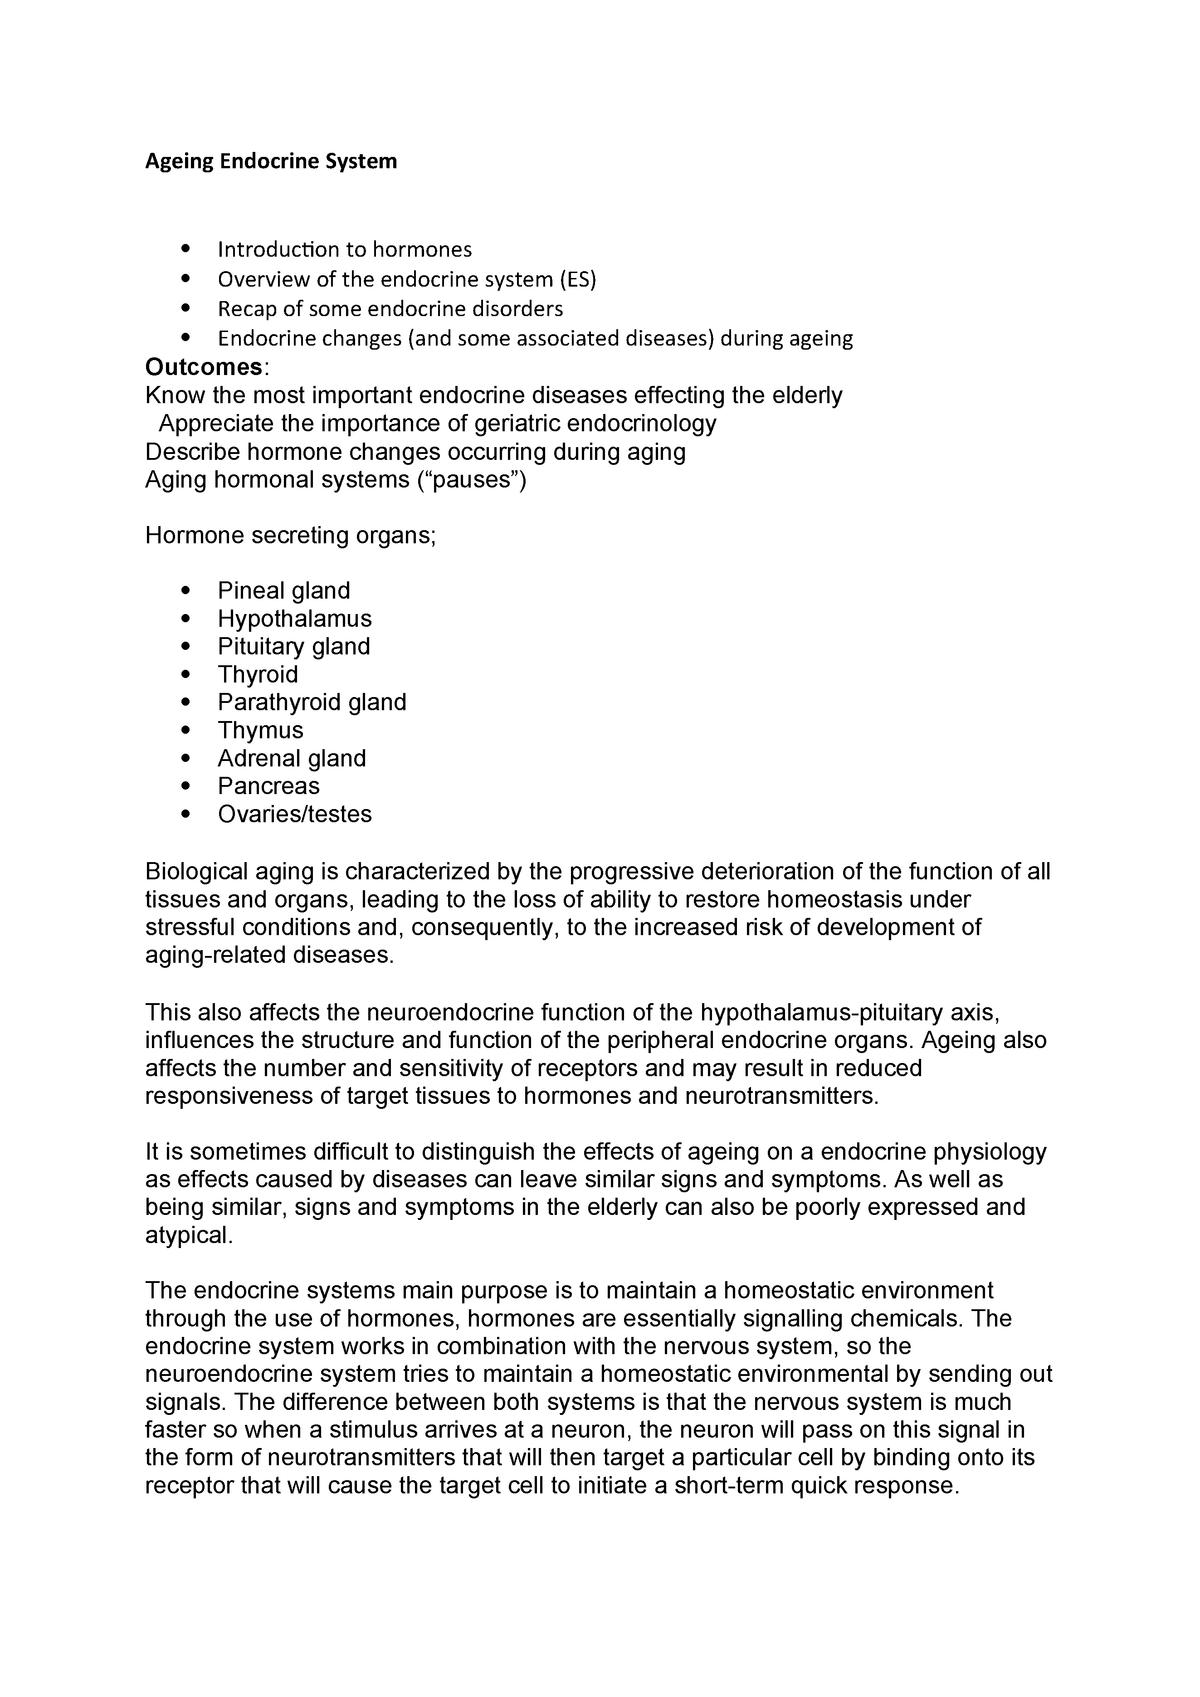 Ageing Endocrine System - Human Neuroscience 6H5Z1013 - MMU